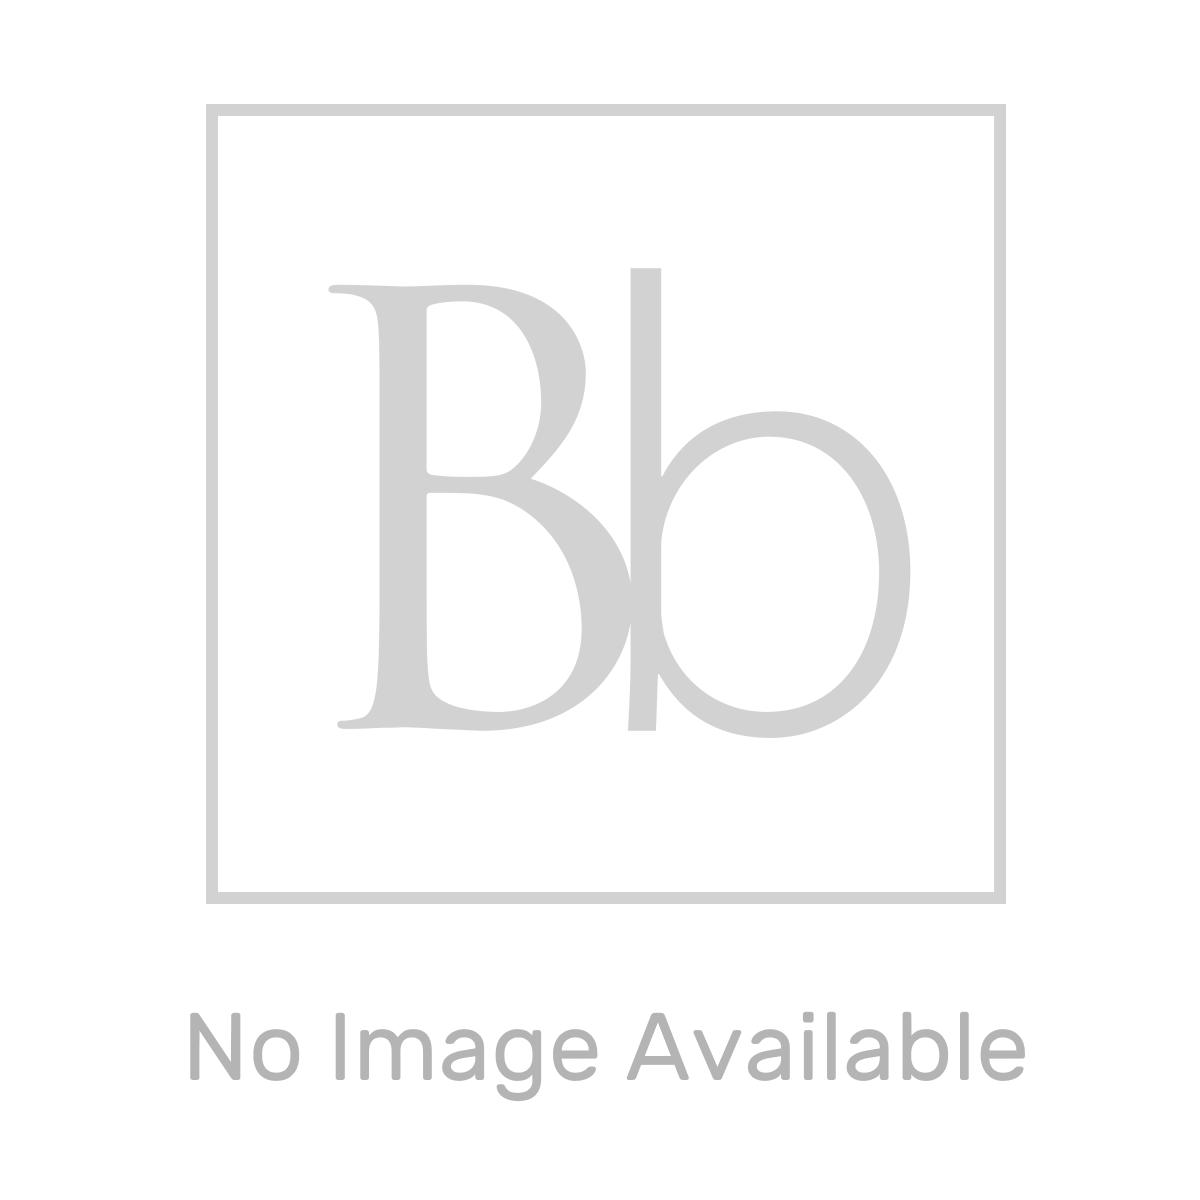 Croydex Bath Screen Seal Kit Detail